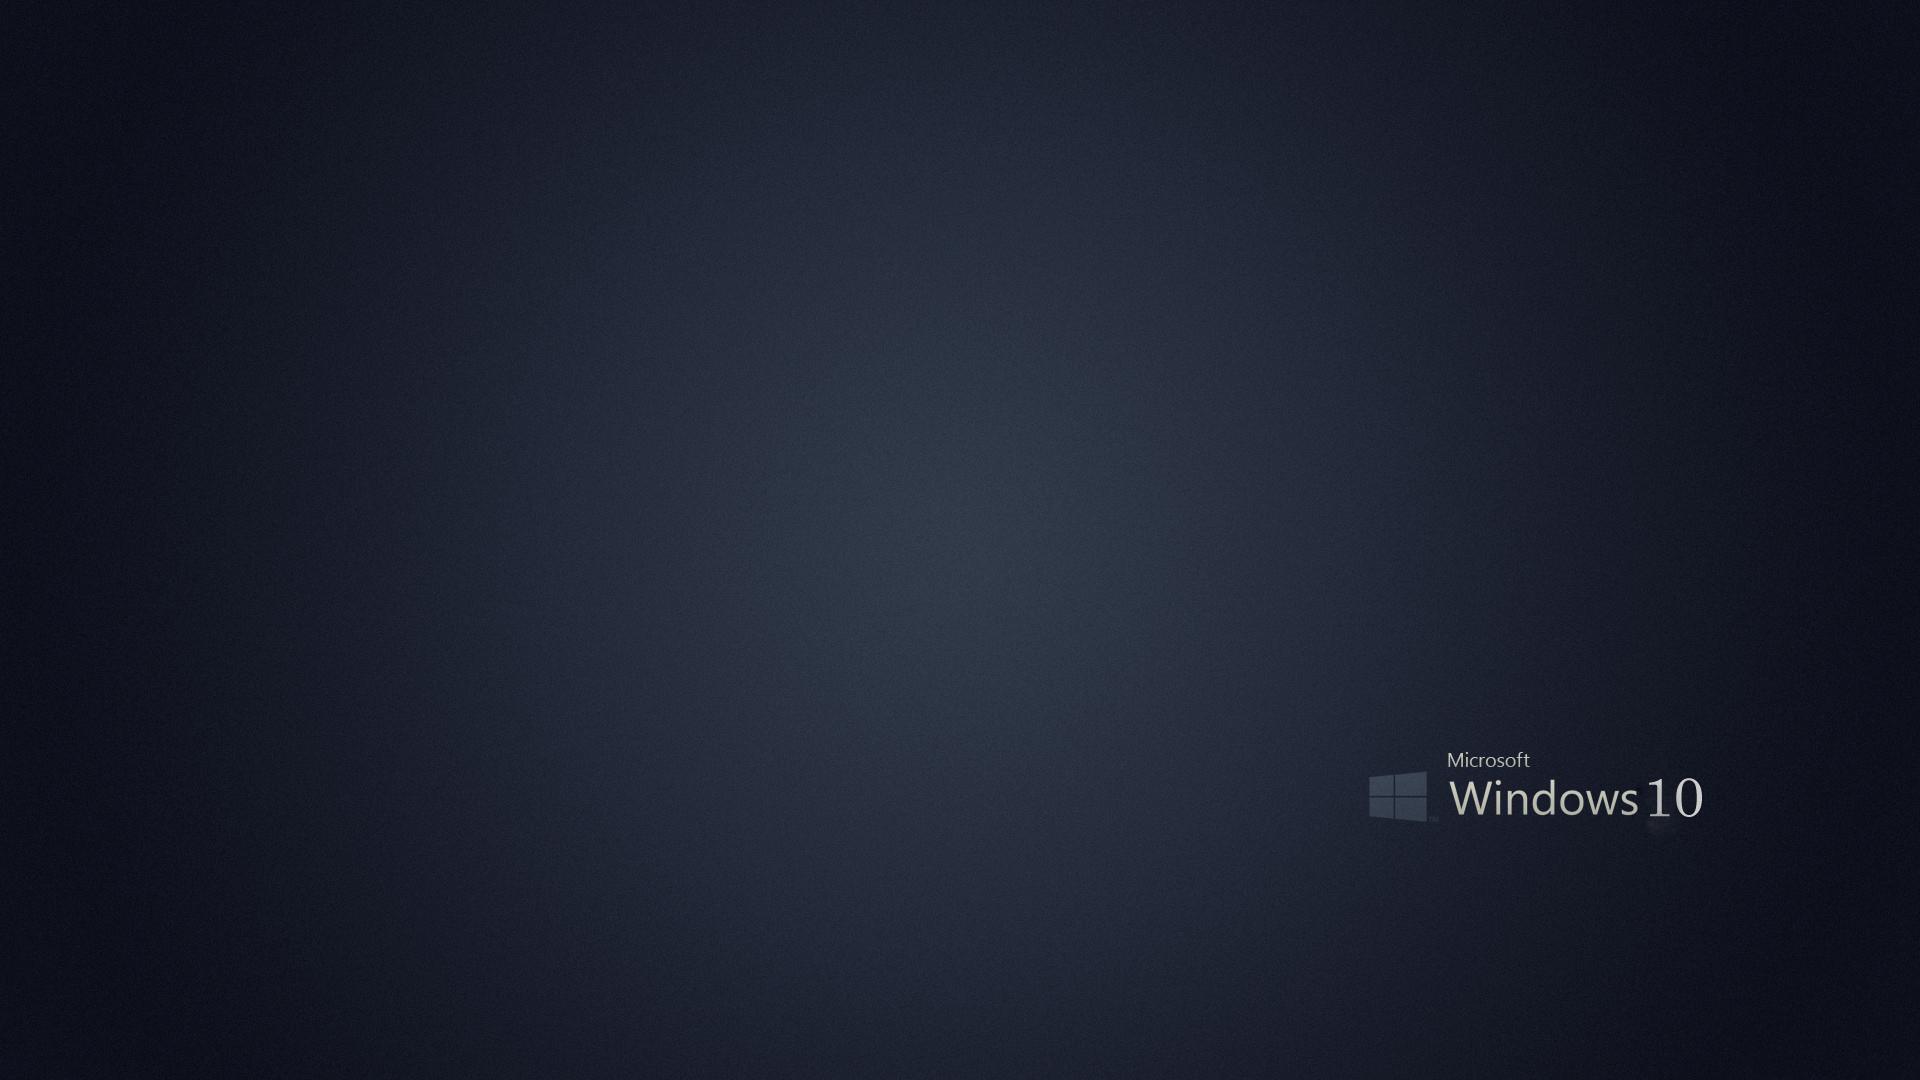 [50+] Jesus Wallpapers for Windows 10 on WallpaperSafari